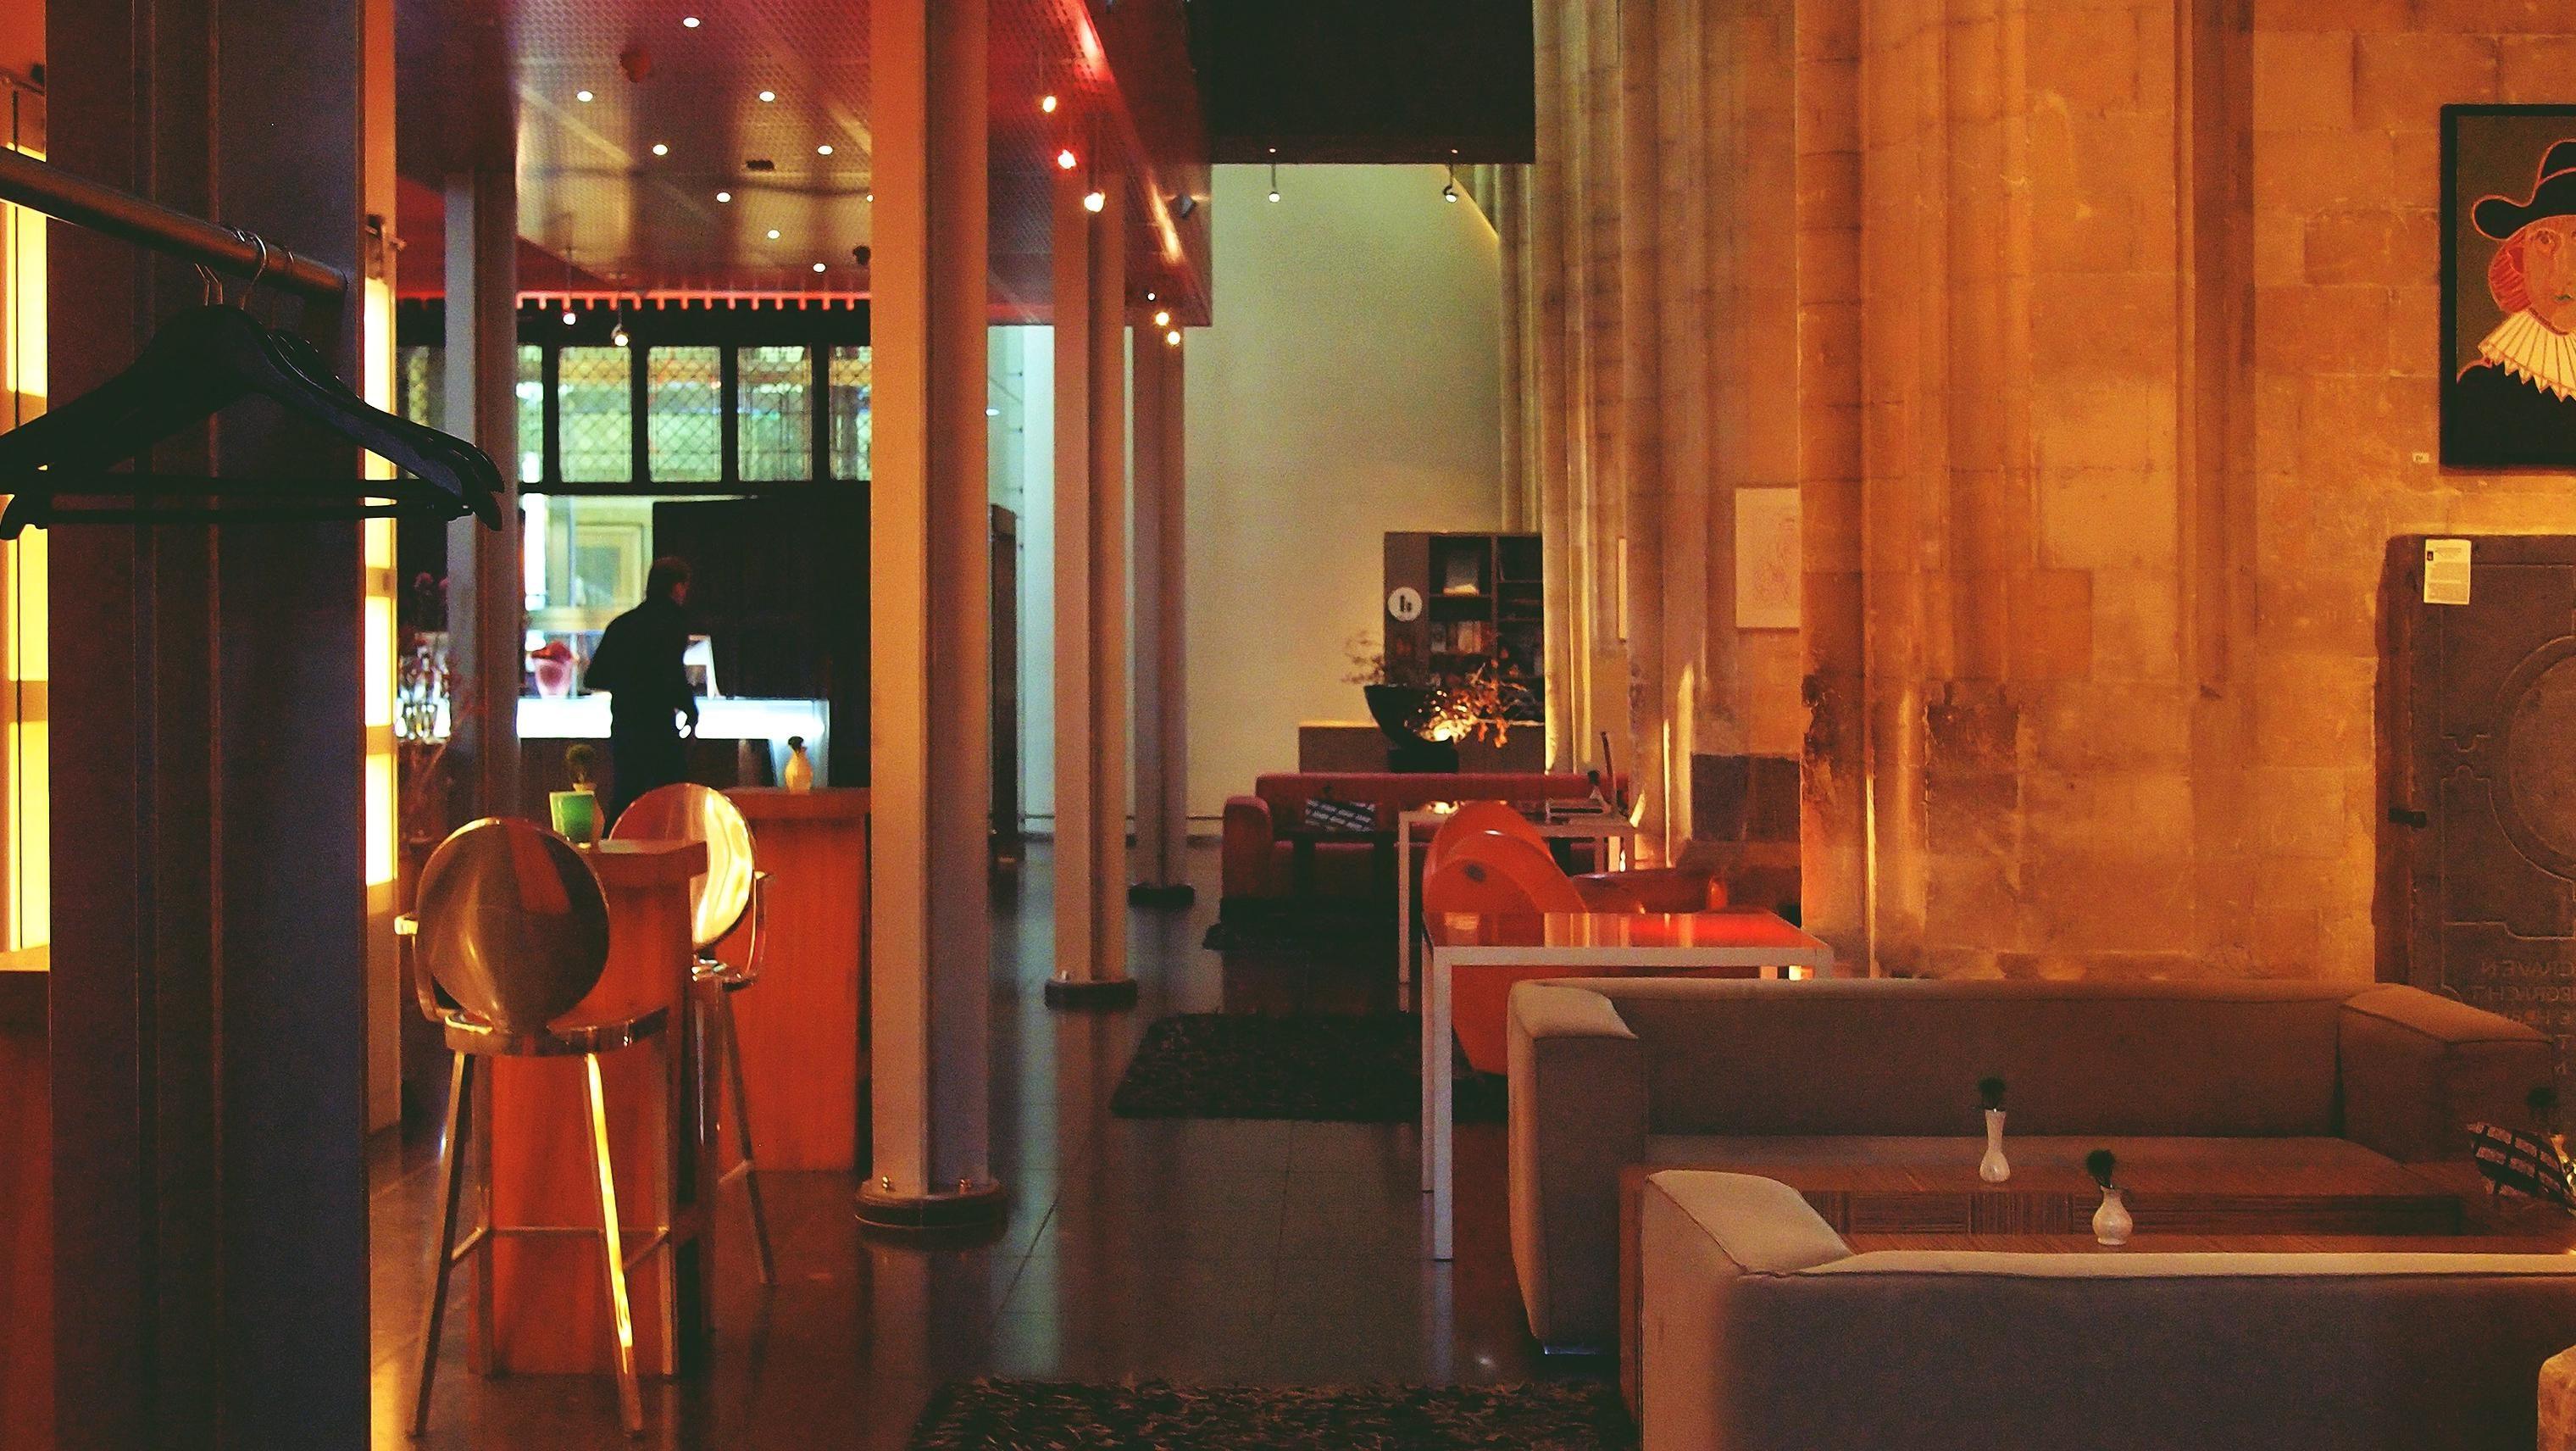 restaurant interior luxury decor modern people room indoors